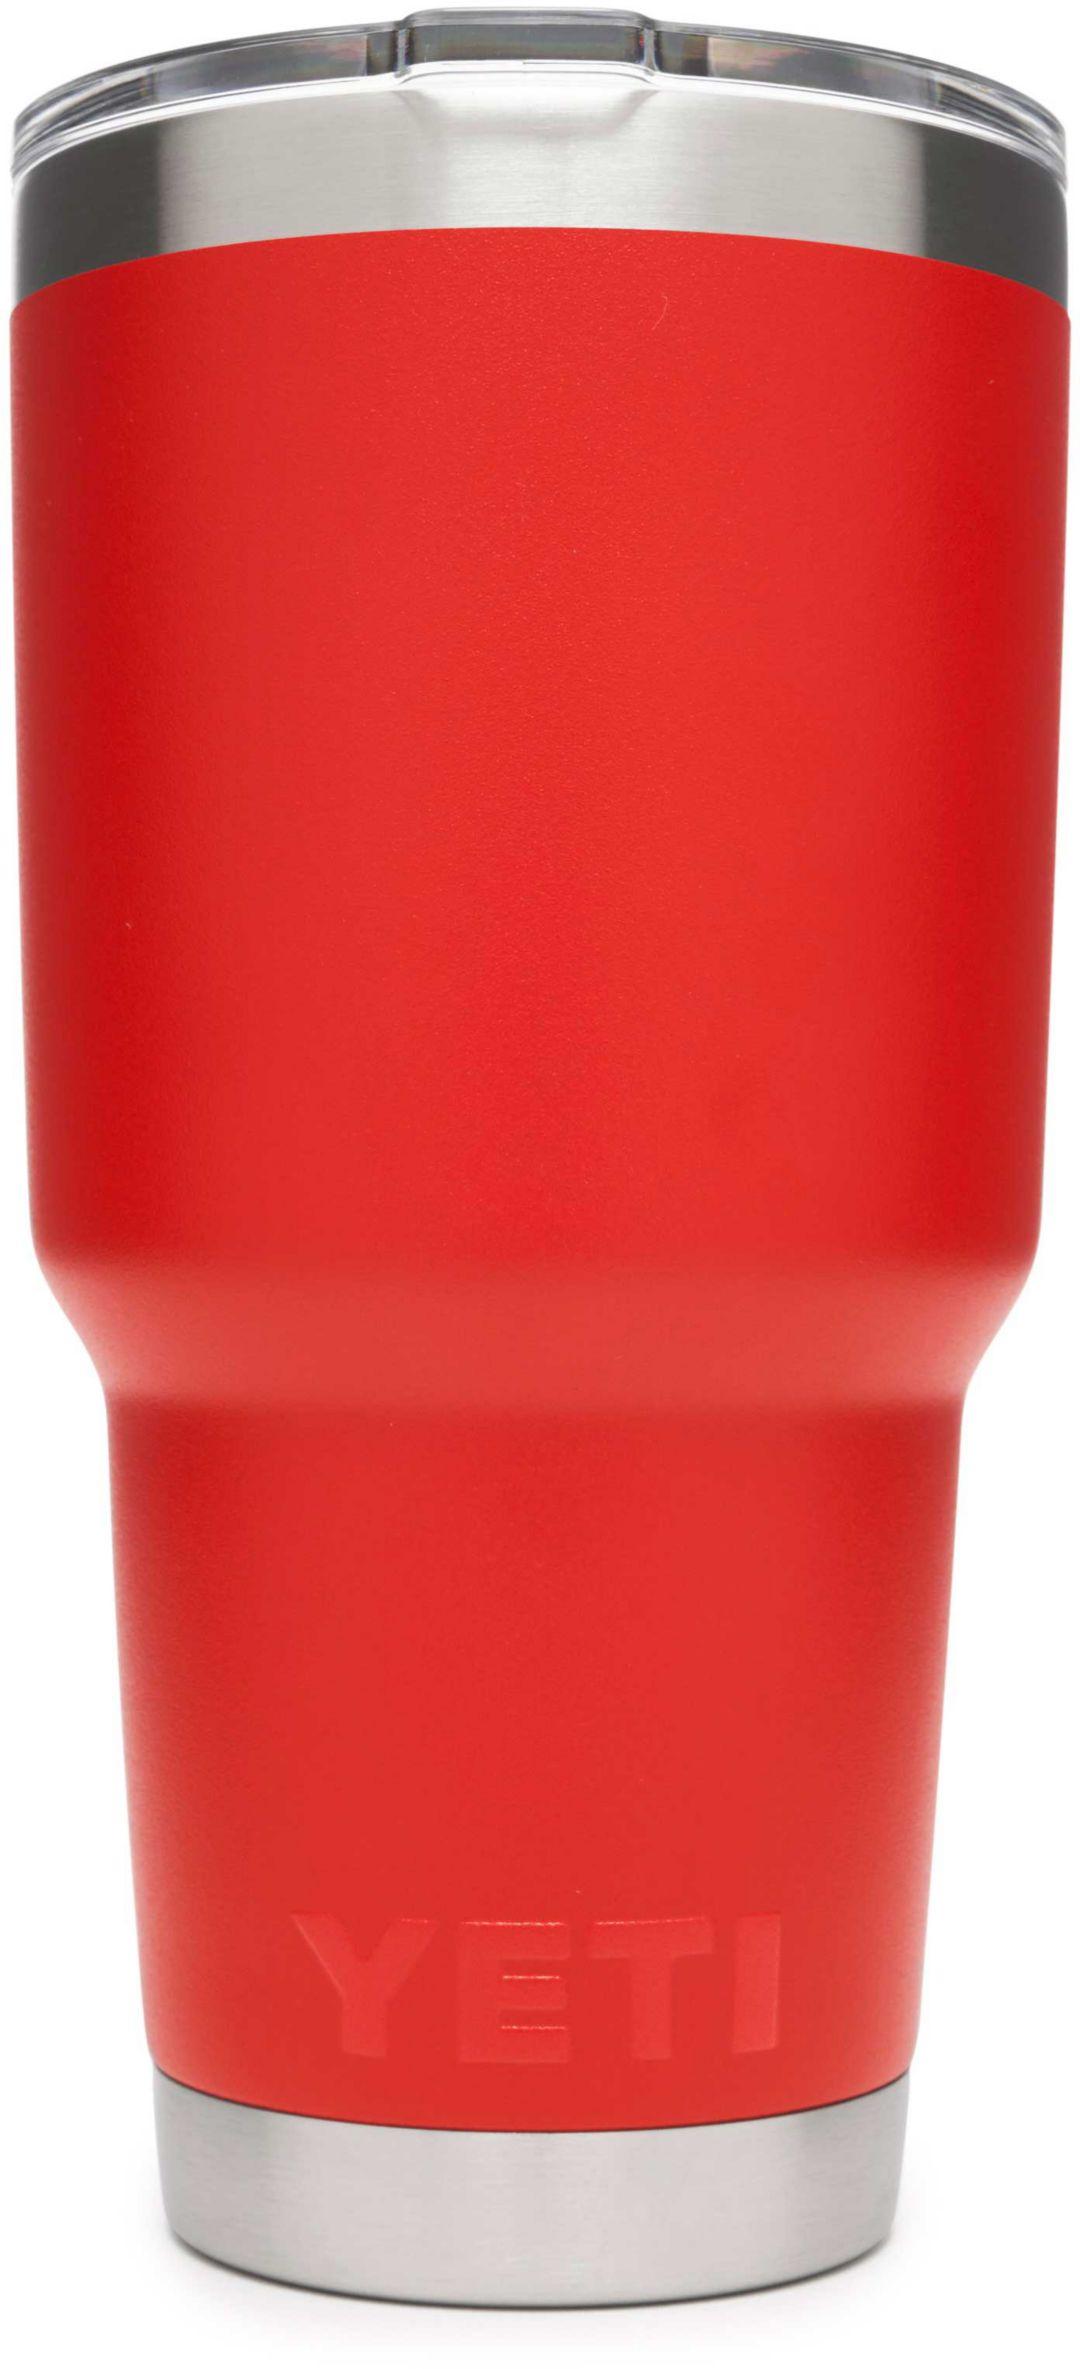 a68f022e9d5 YETI 30 oz. Rambler Tumbler with MagSlider Lid